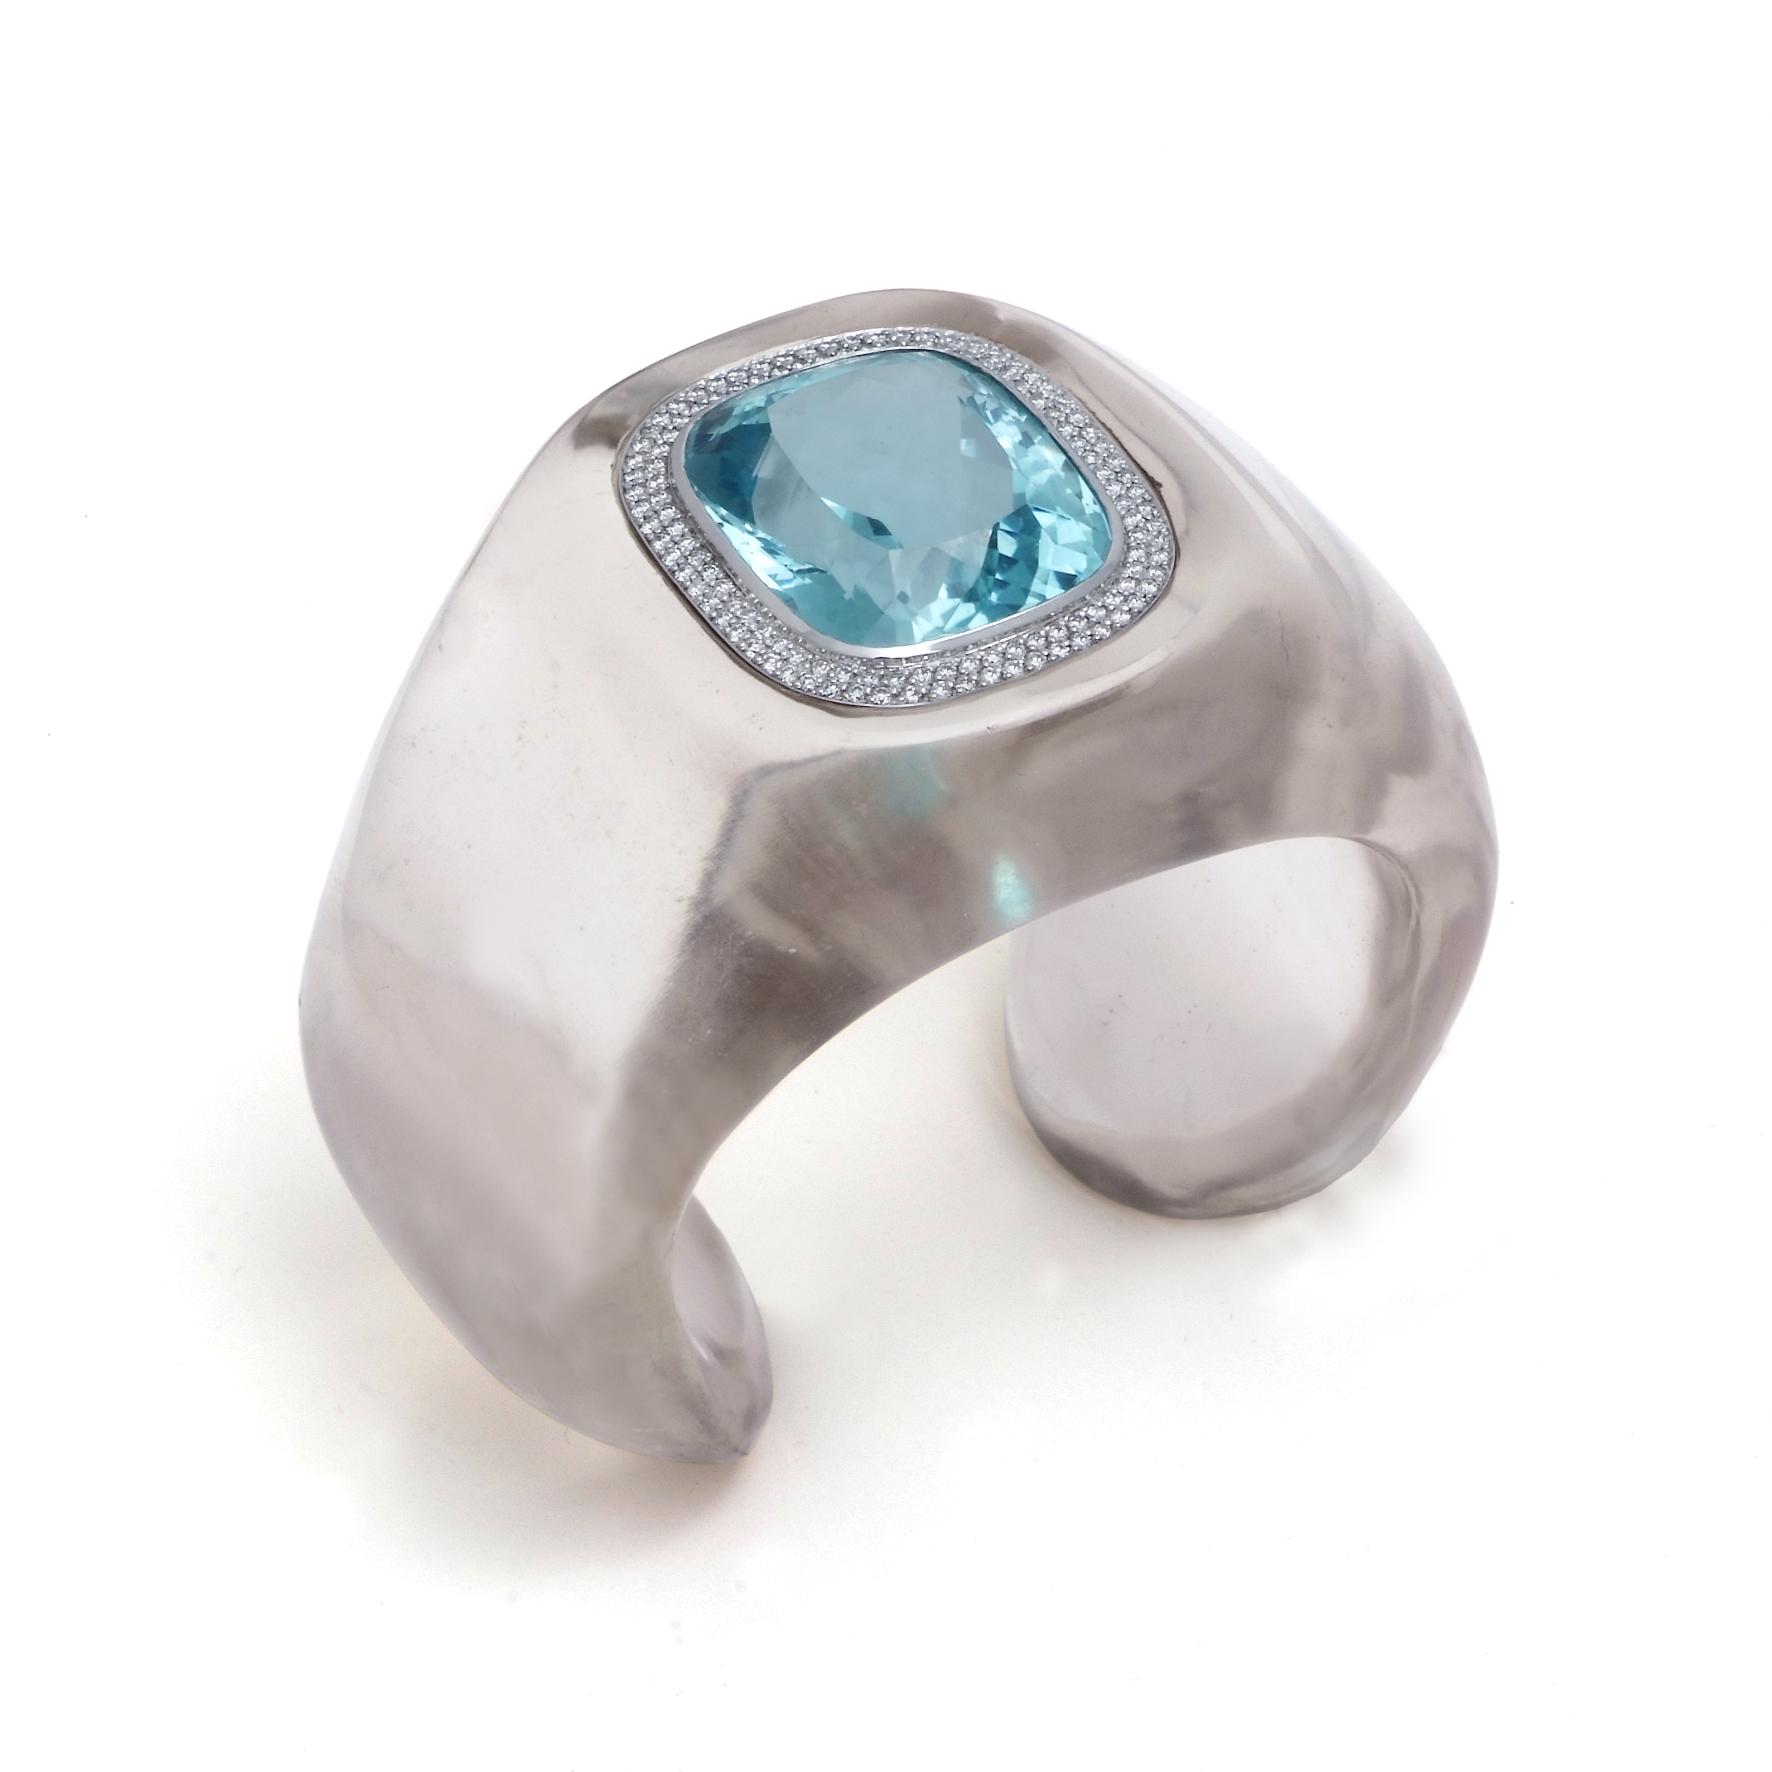 Bear Brooksbank crystal cuff